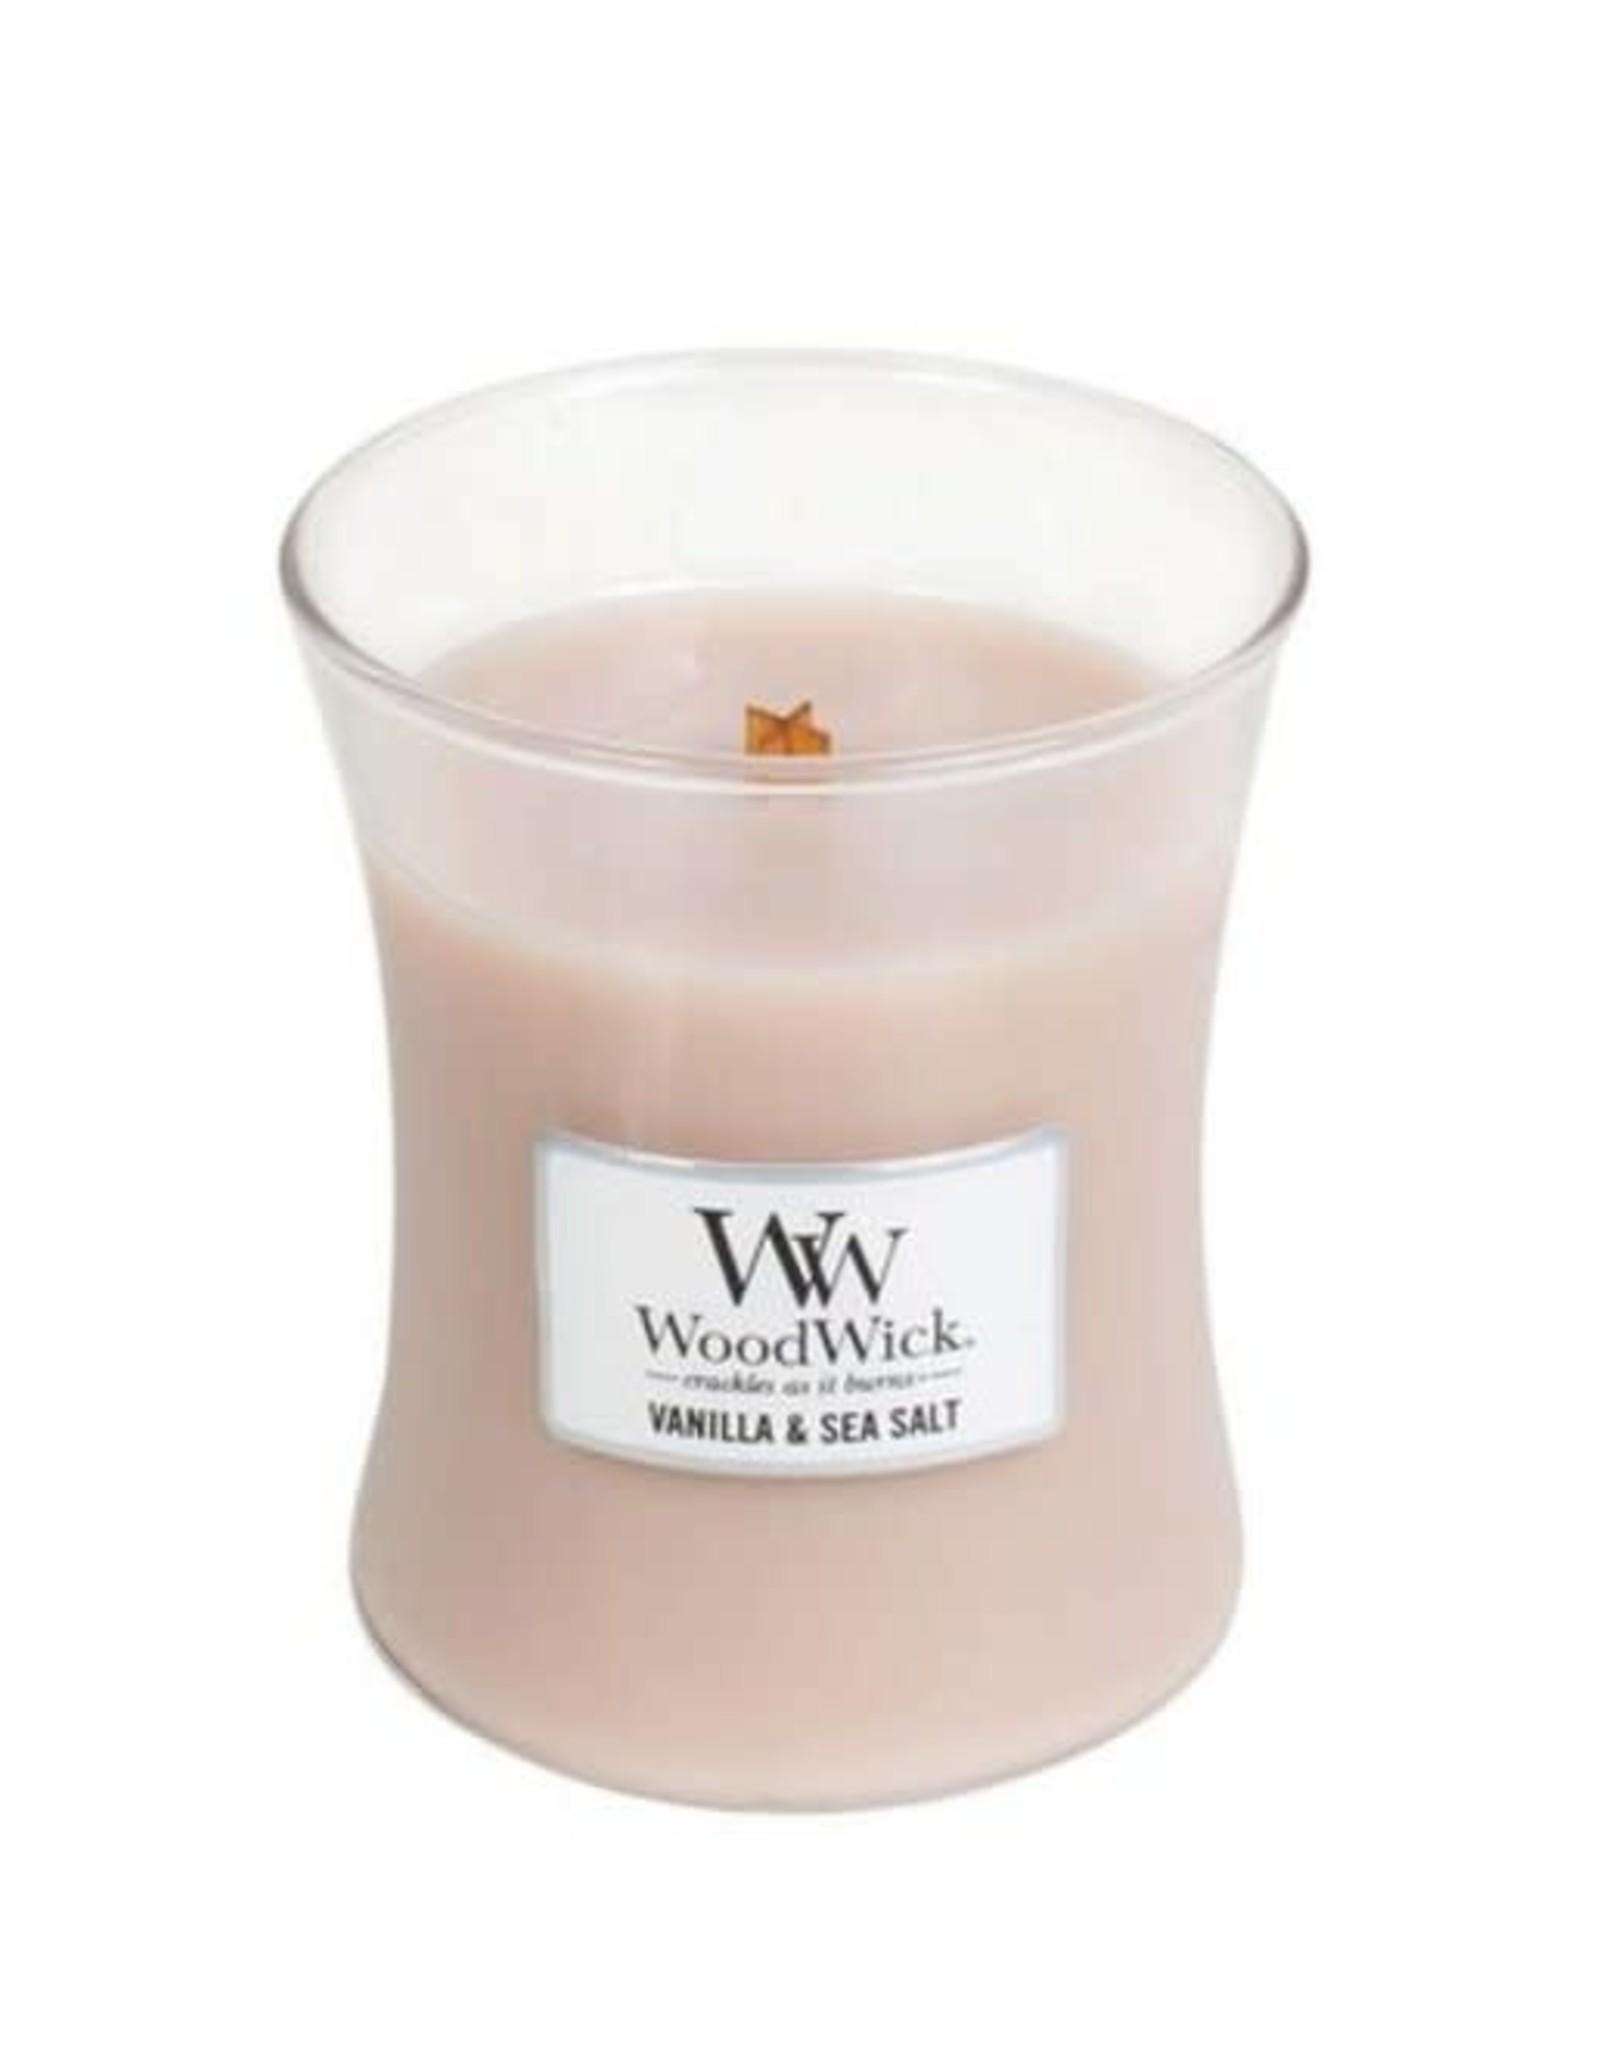 Woodwick Bougie vanille & sea salt